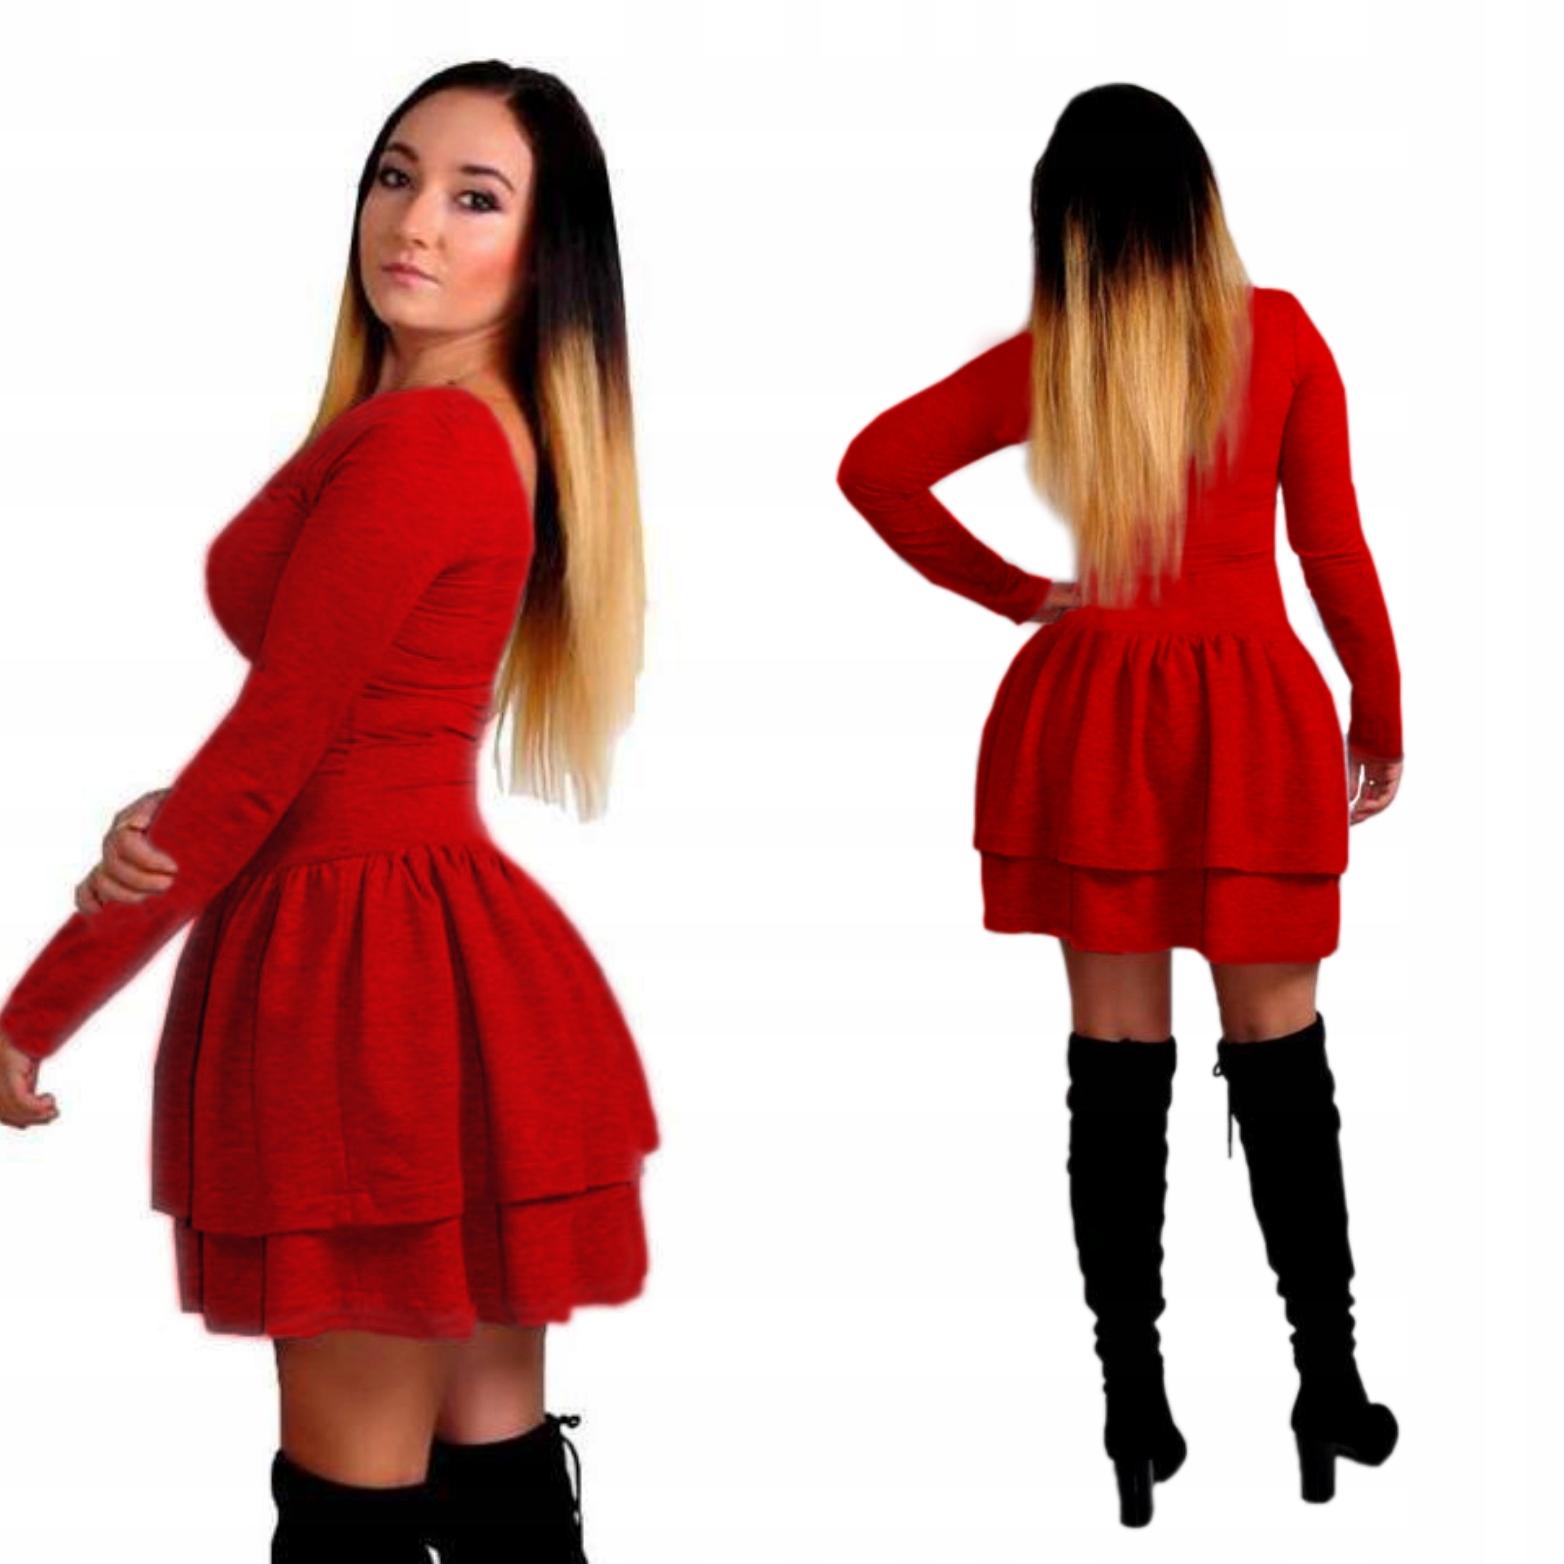 d415f62870 Sukienka dresowa z Falbankami rękaw 2 kolory XS S 7047821527 - Allegro.pl